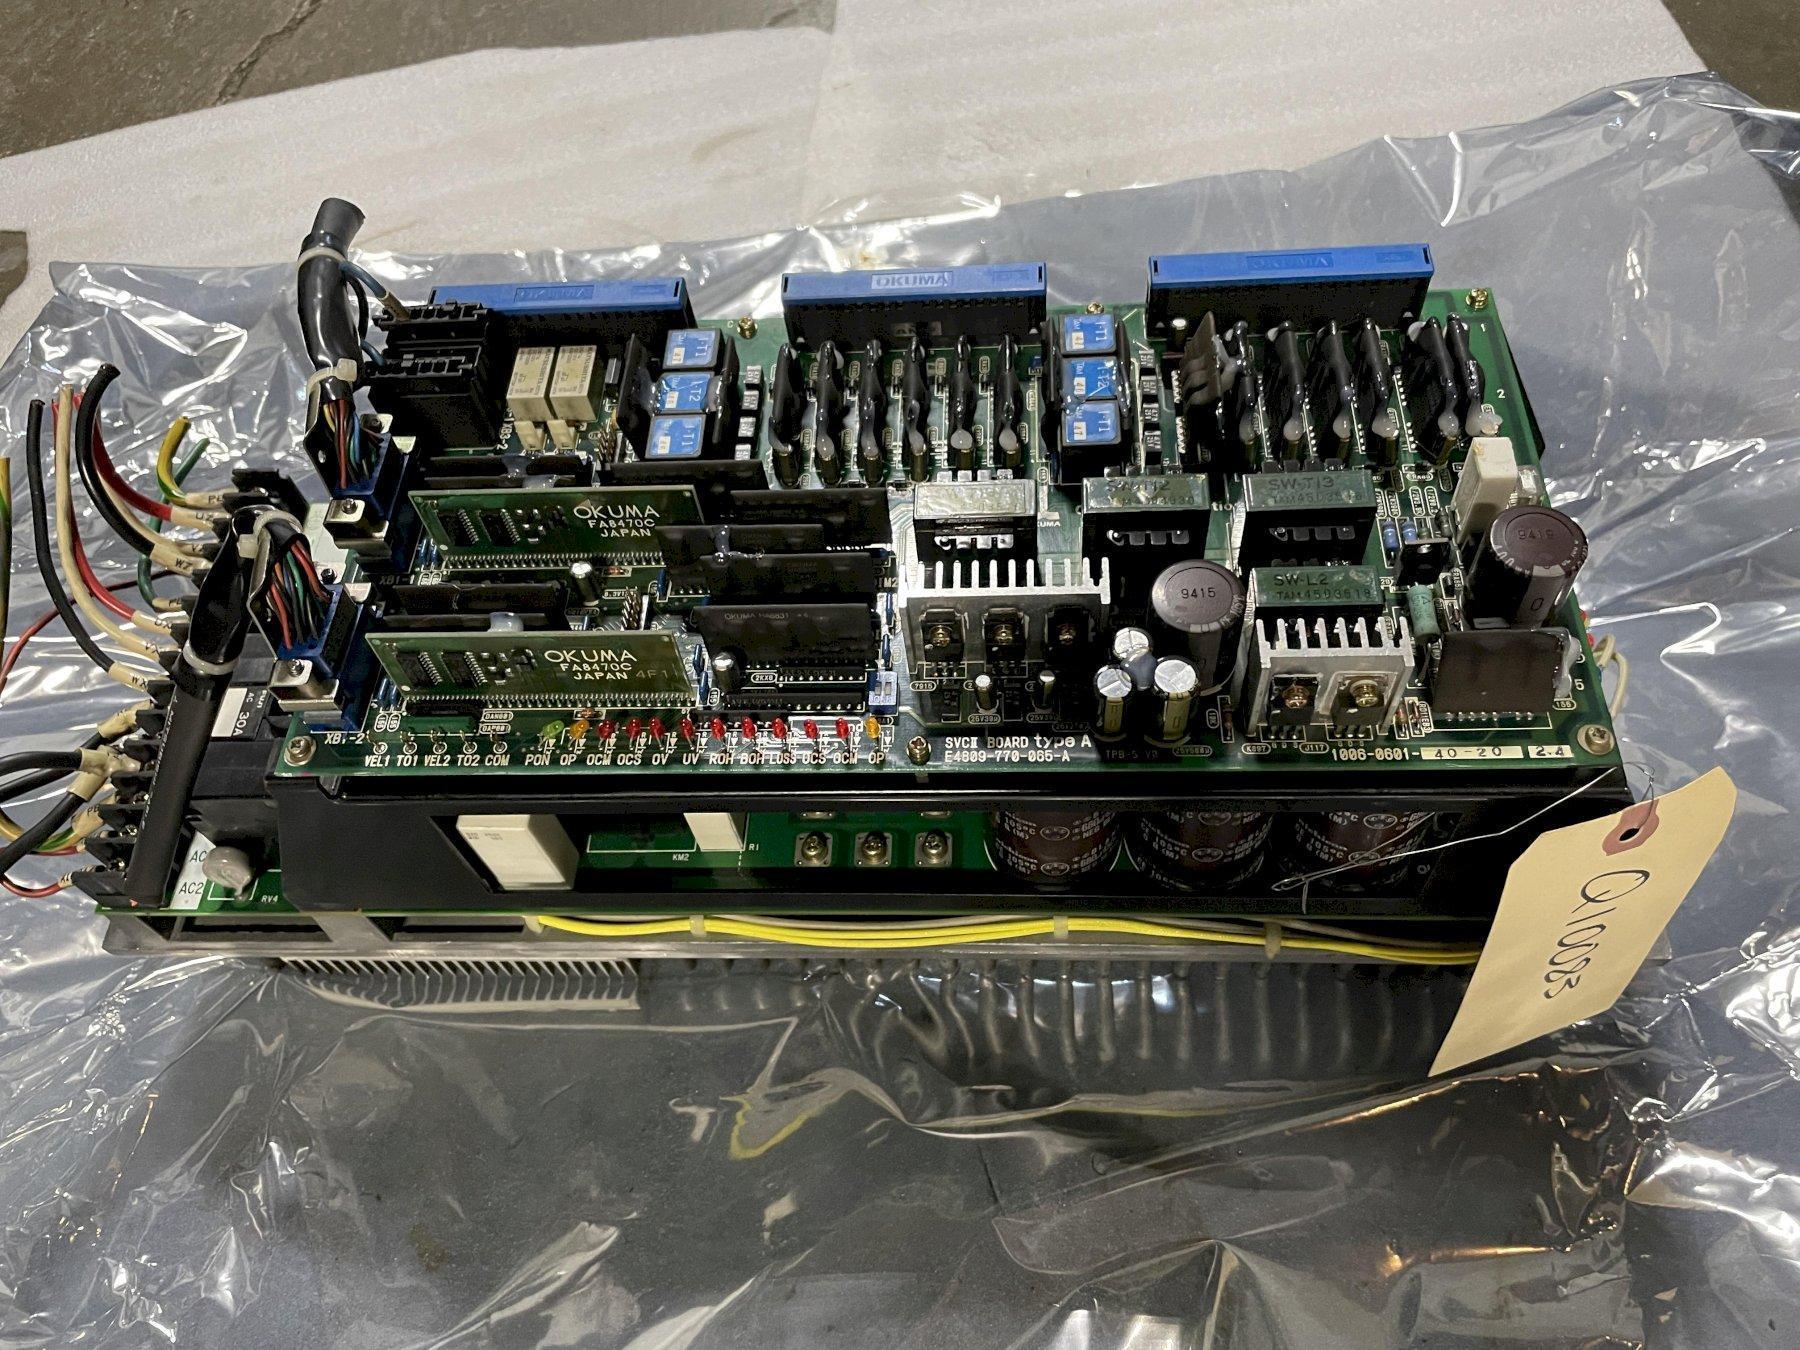 Okuma Dual Axis Drive, BLII-D, 75-50, E4809-770-065-A